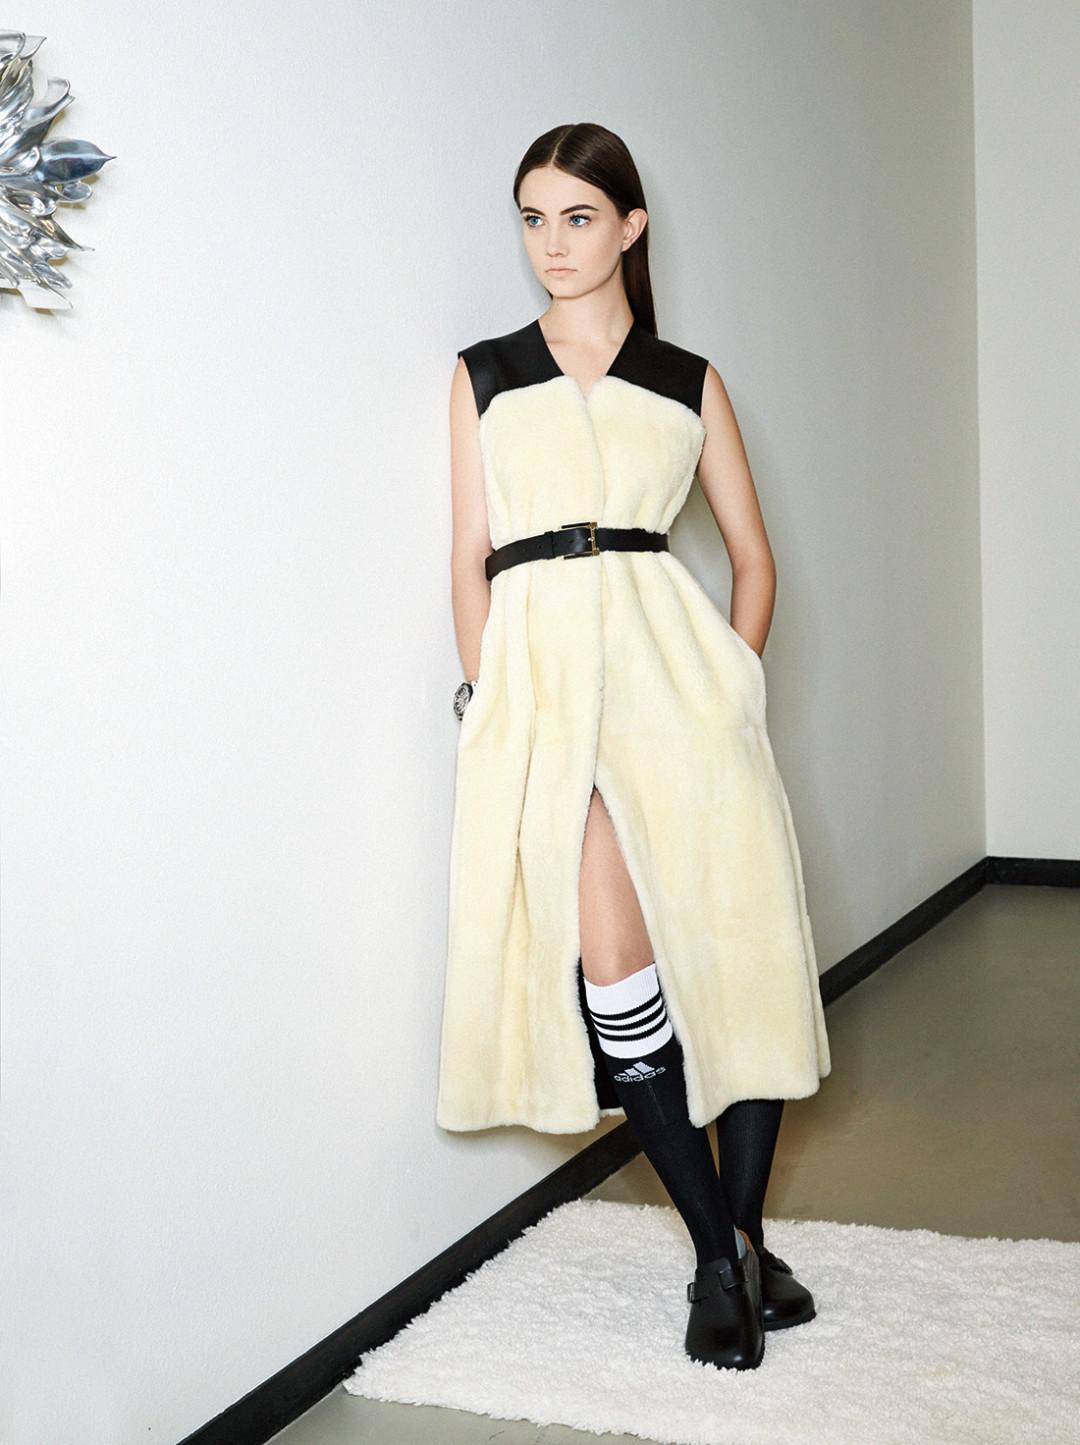 0215 plain spoken cream black dress j0pkze